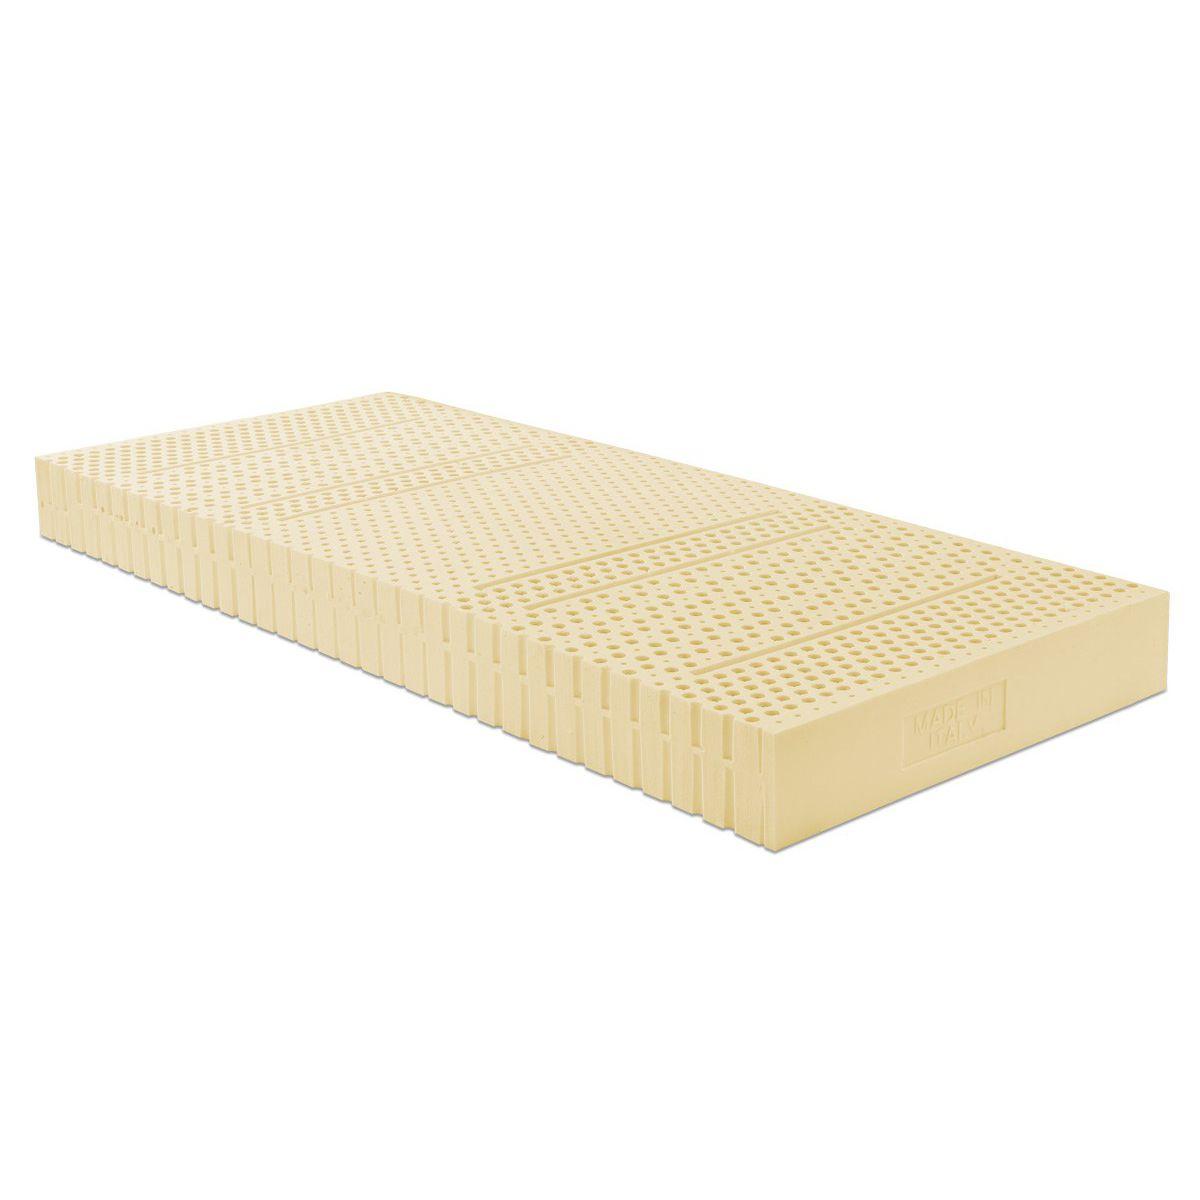 Double Mattress Latex Foam 180x200 Cm Latex Absolute Horm